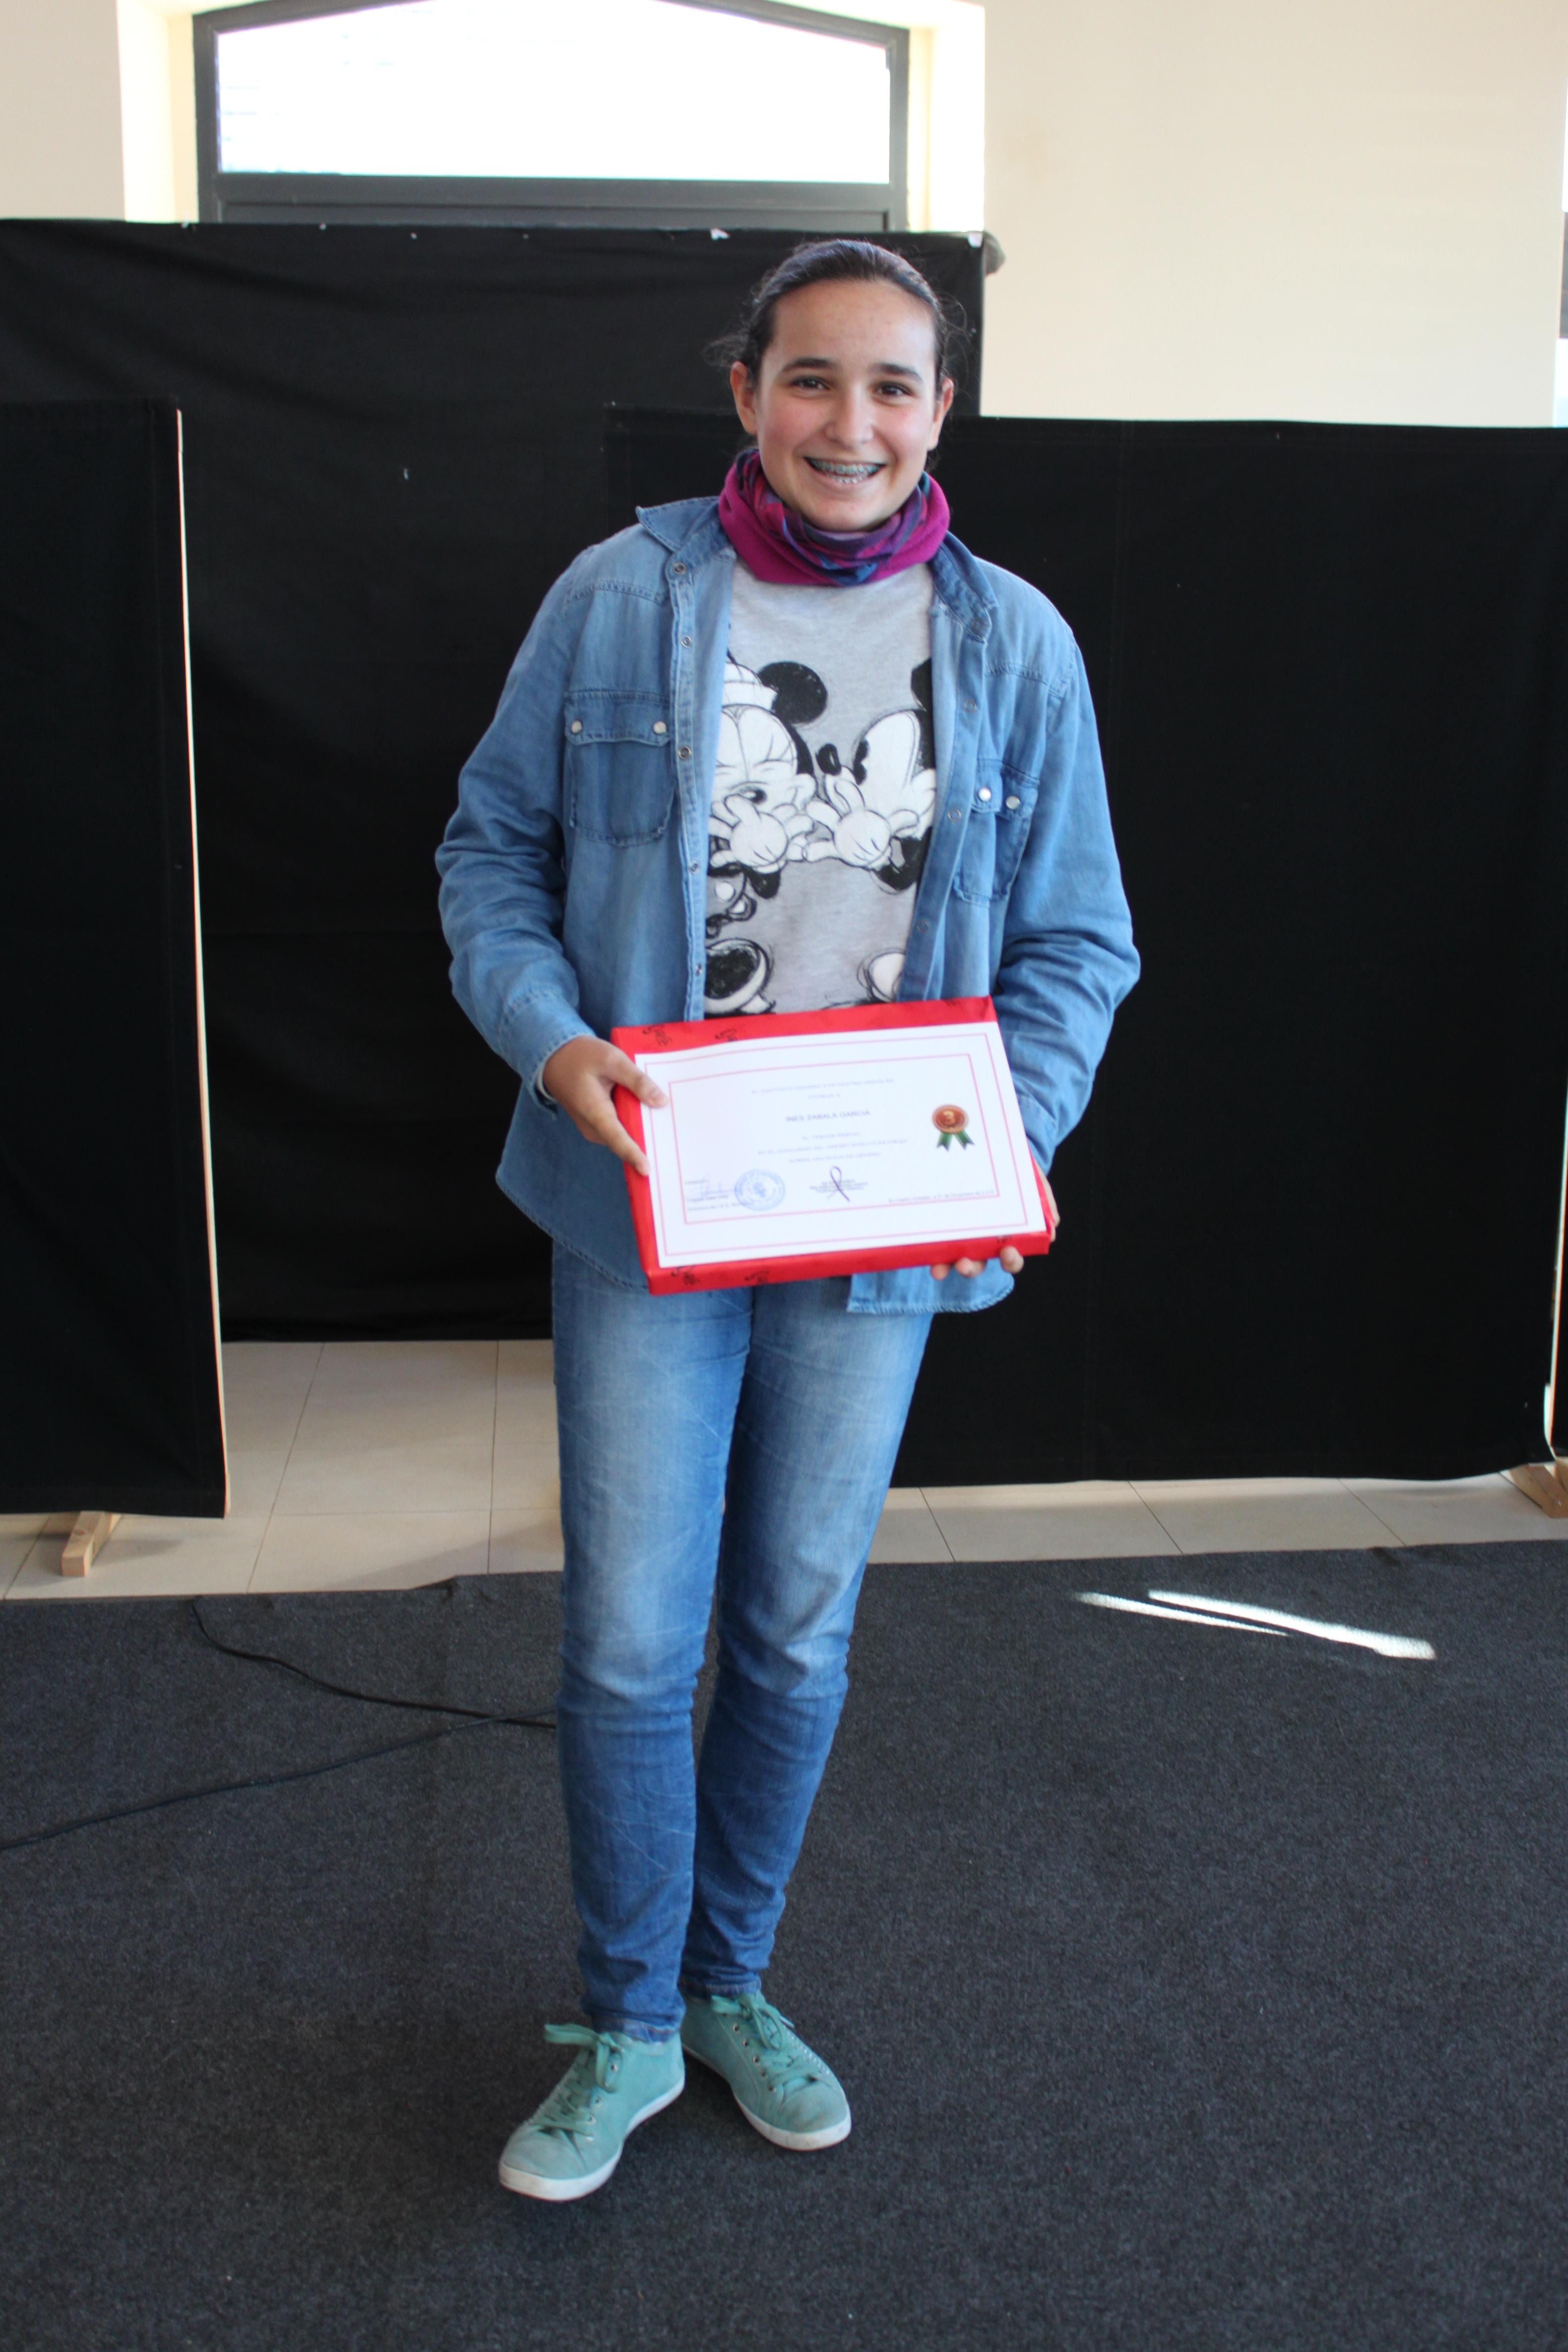 Inés recoge su premio